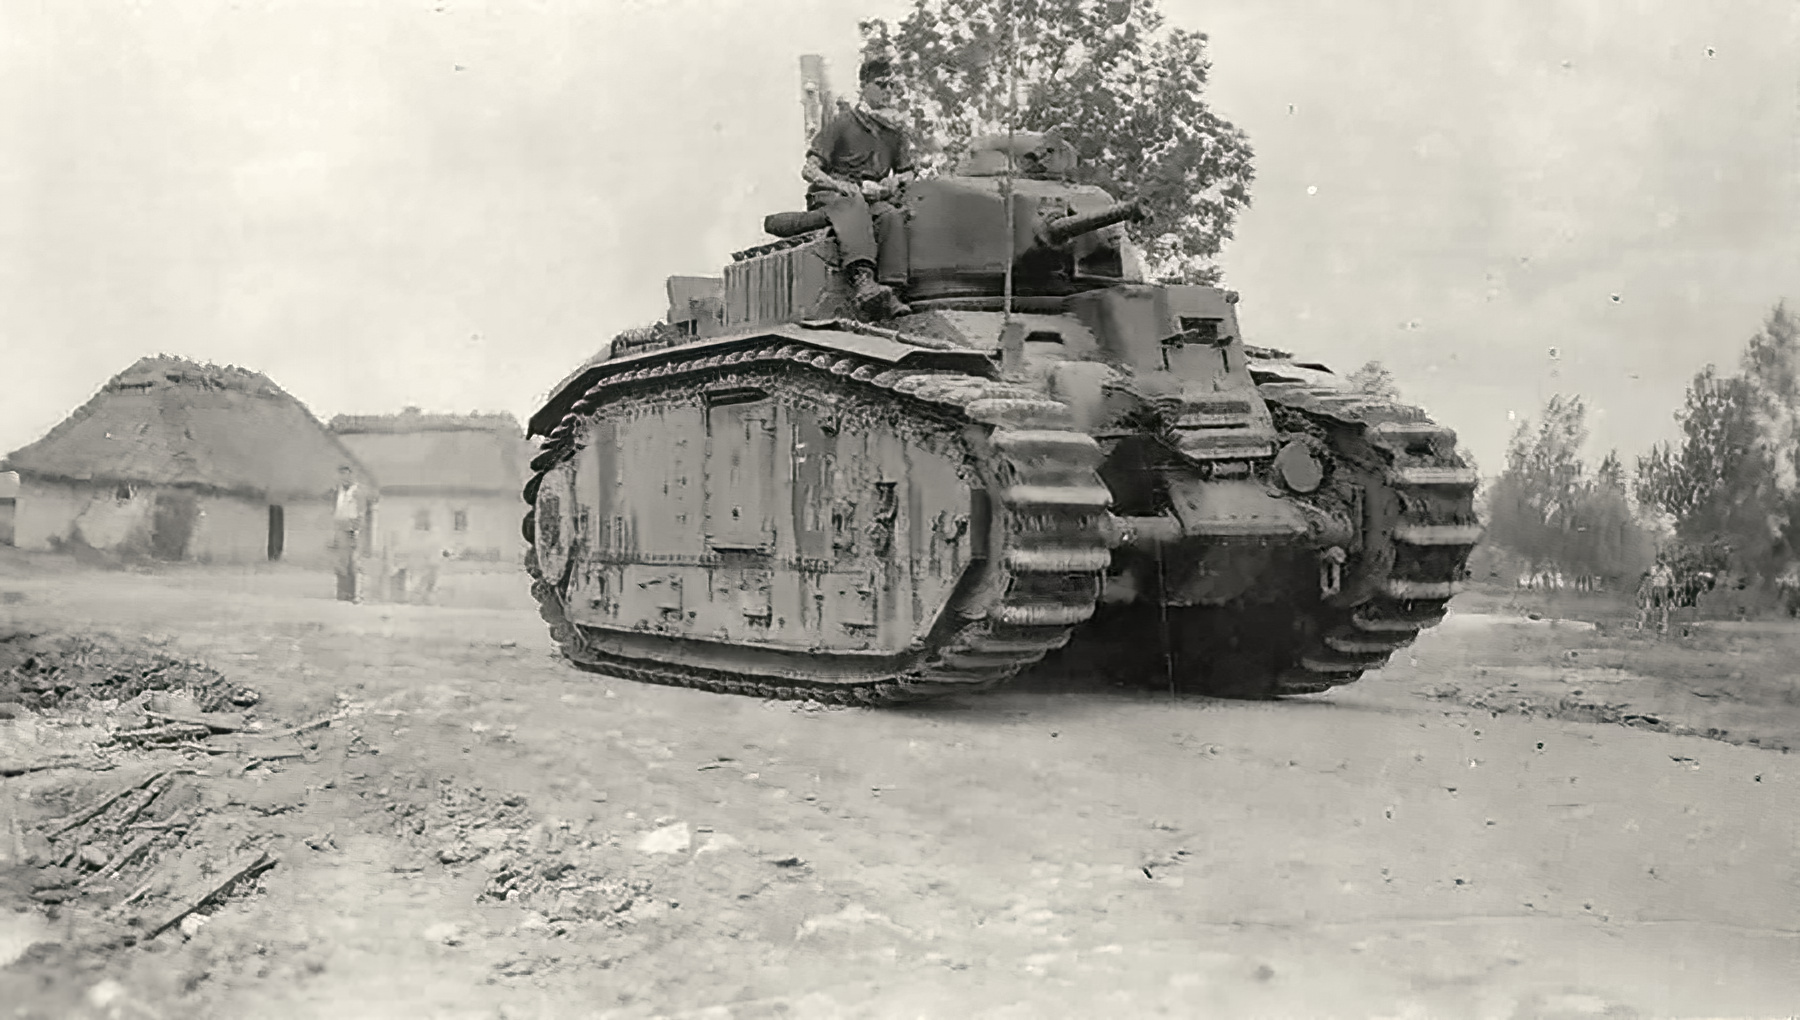 Wehrmacht Flammwagen auf Panzerkampfwagen B2 740(f) flame thrower tank converted Char B1 01